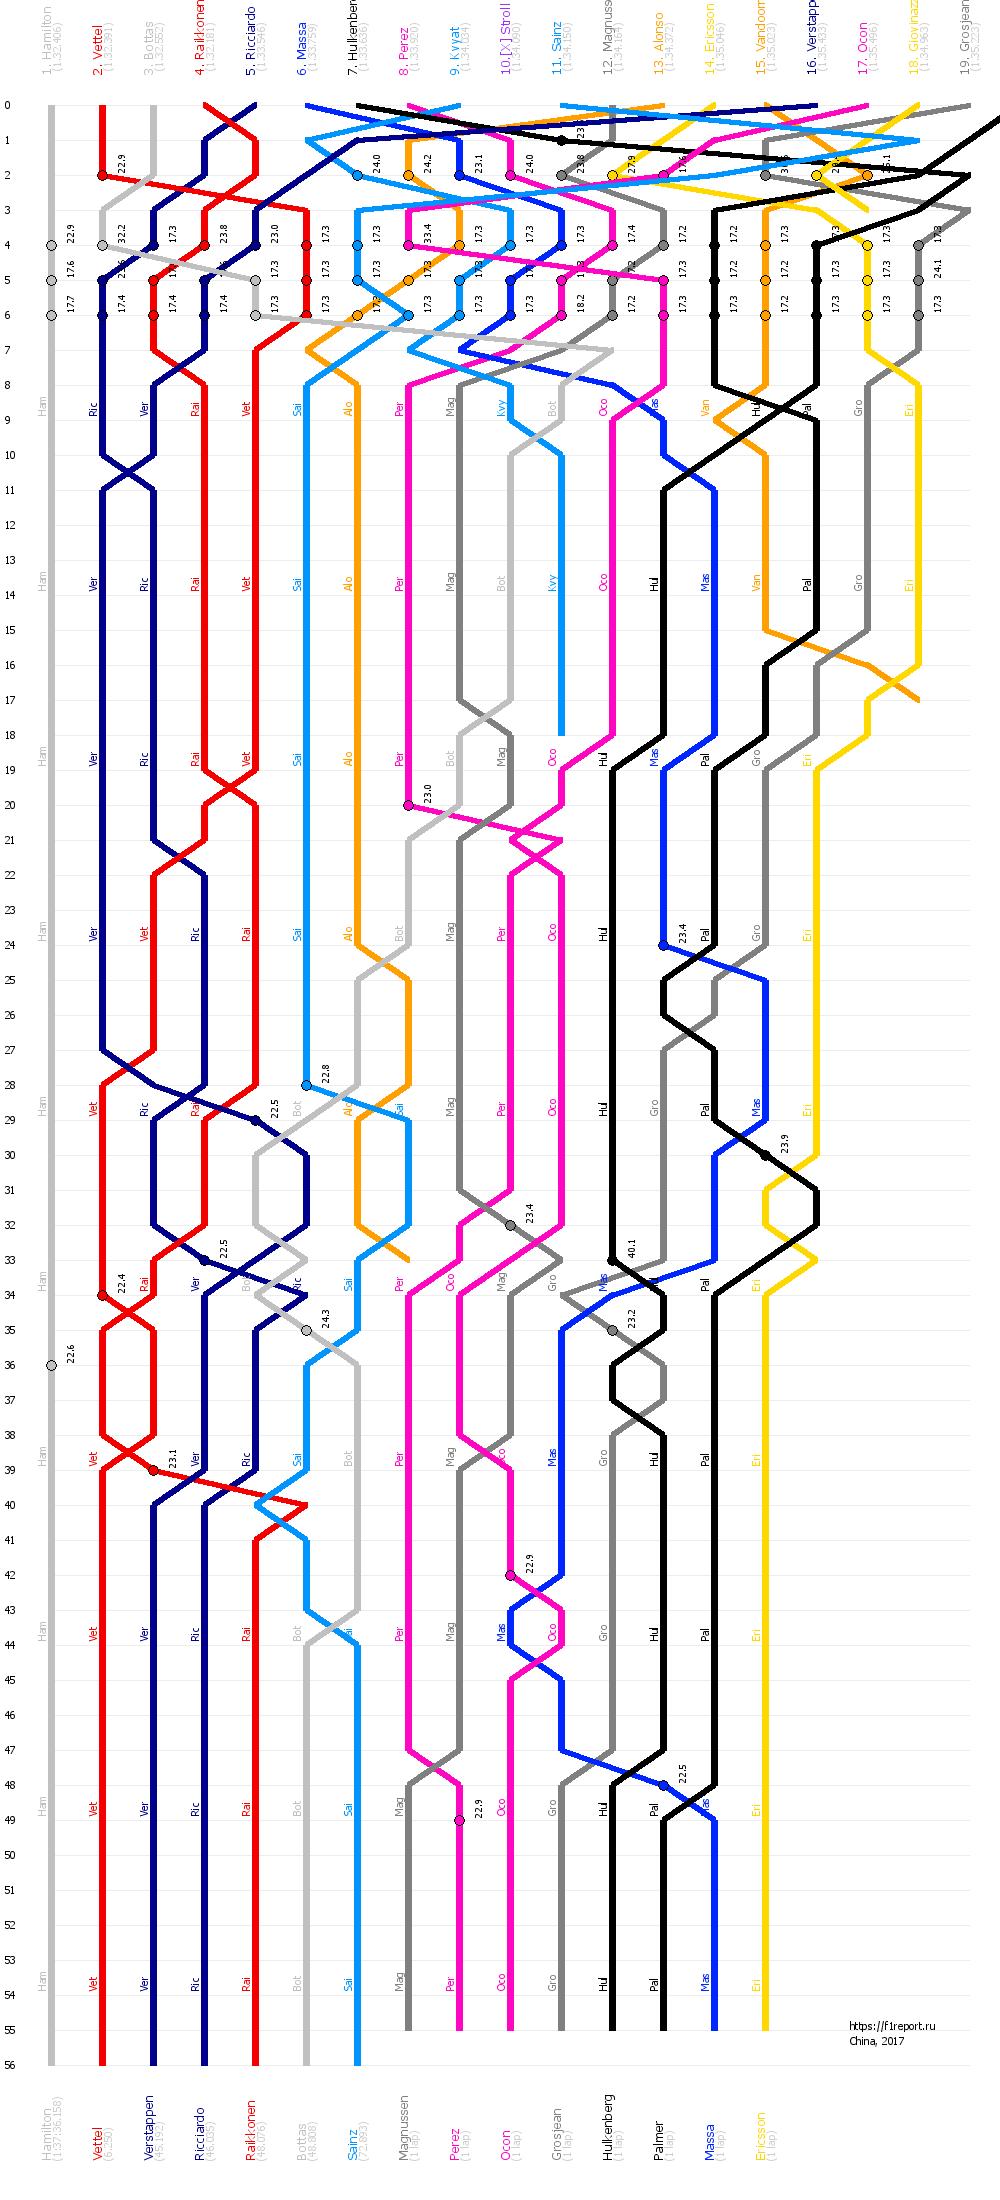 Гран при Китая 2017 | График F1